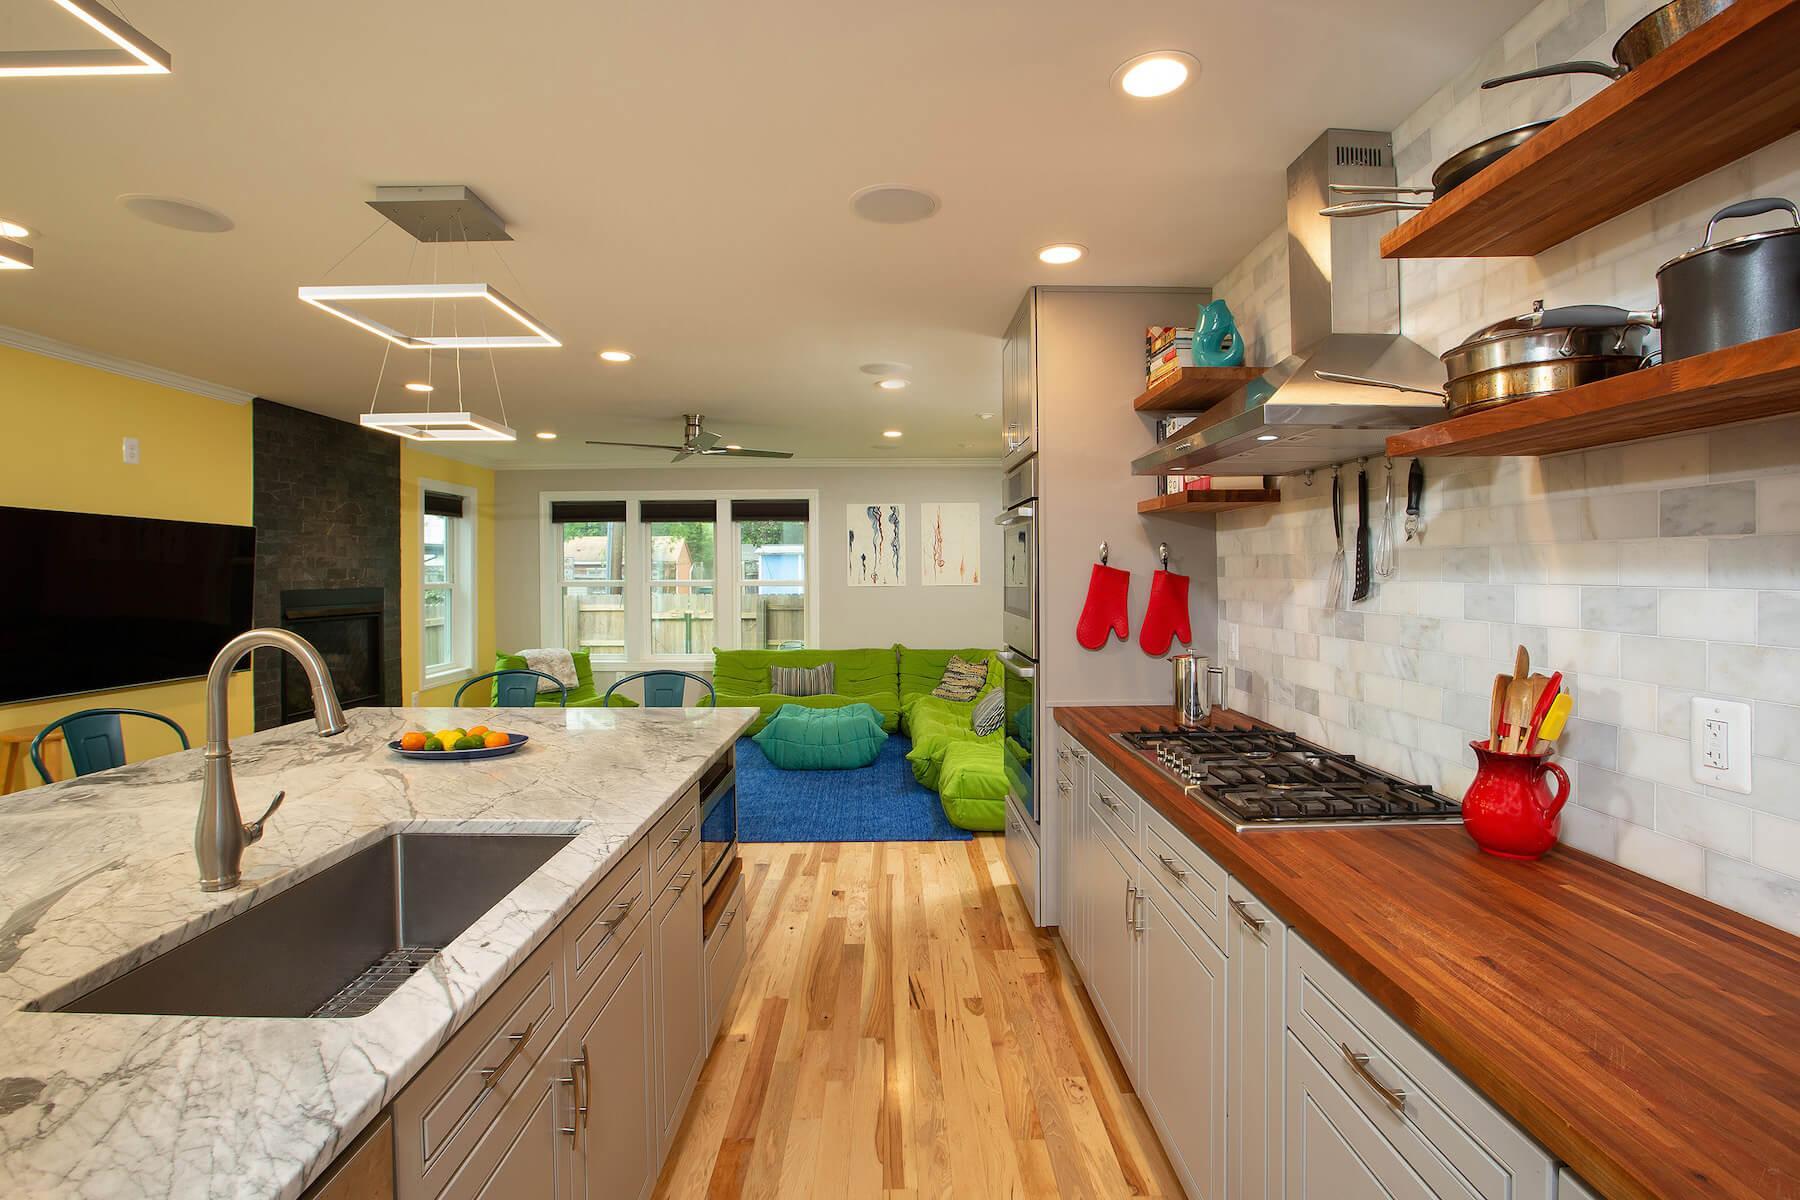 kitchen.livingroom_5-17-19_223